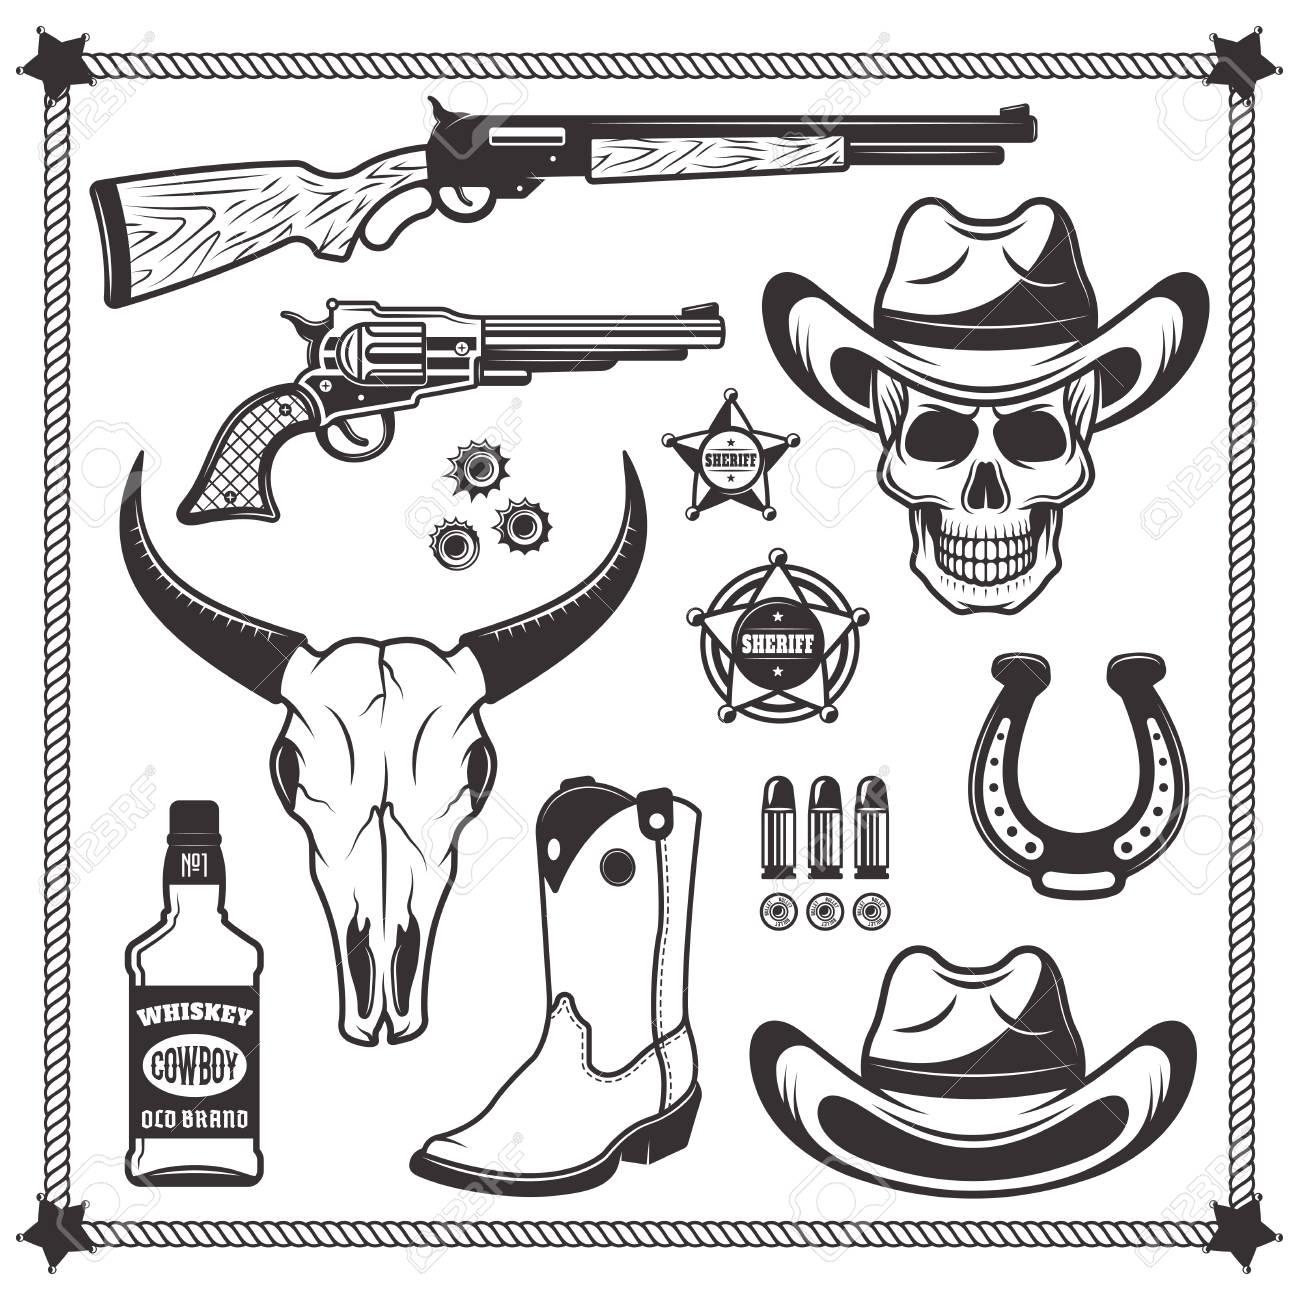 Wunderbar Cowboy Bilderrahmen Zeitgenössisch - Rahmen Ideen ...